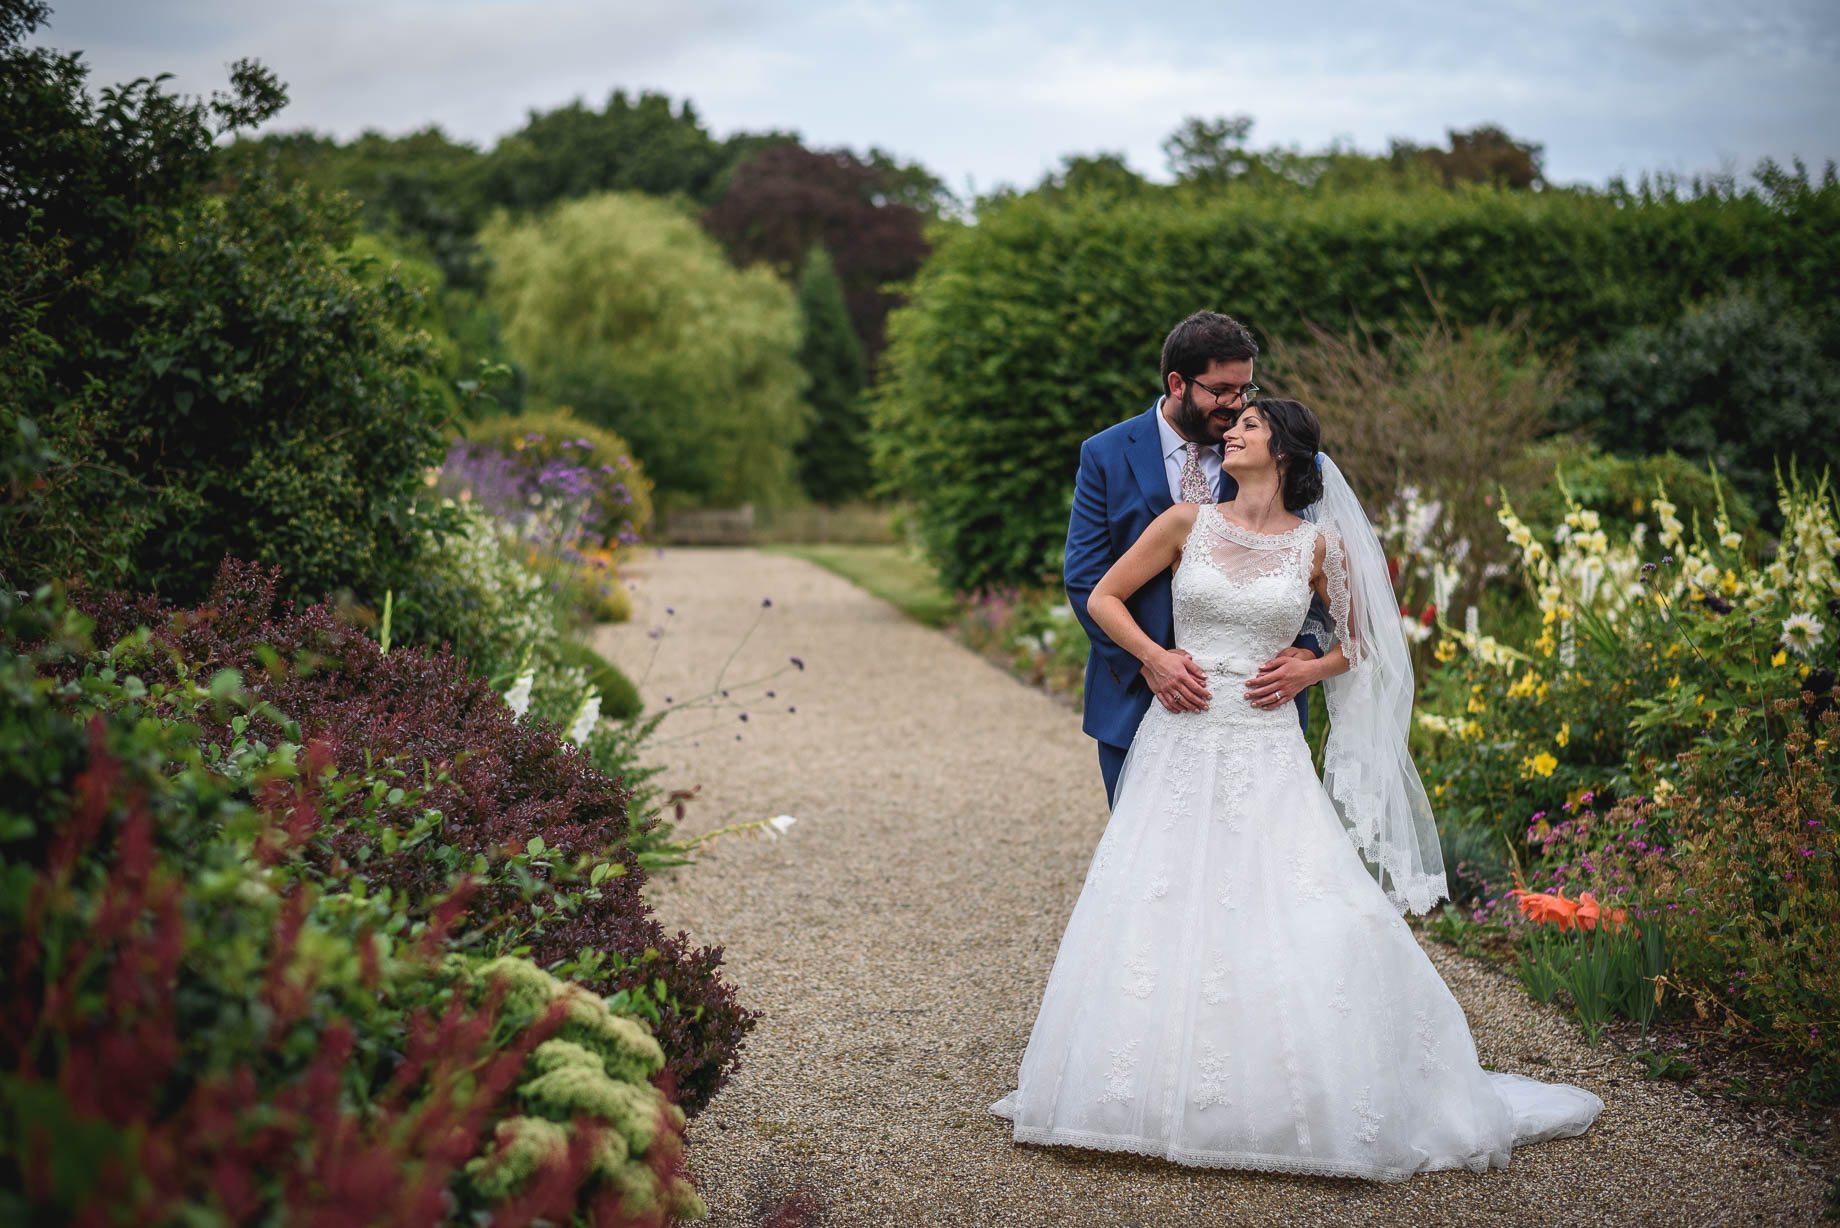 Gaynes Park wedding photography - Guy Collier Photography - Rachel and Jon (138 of 169)